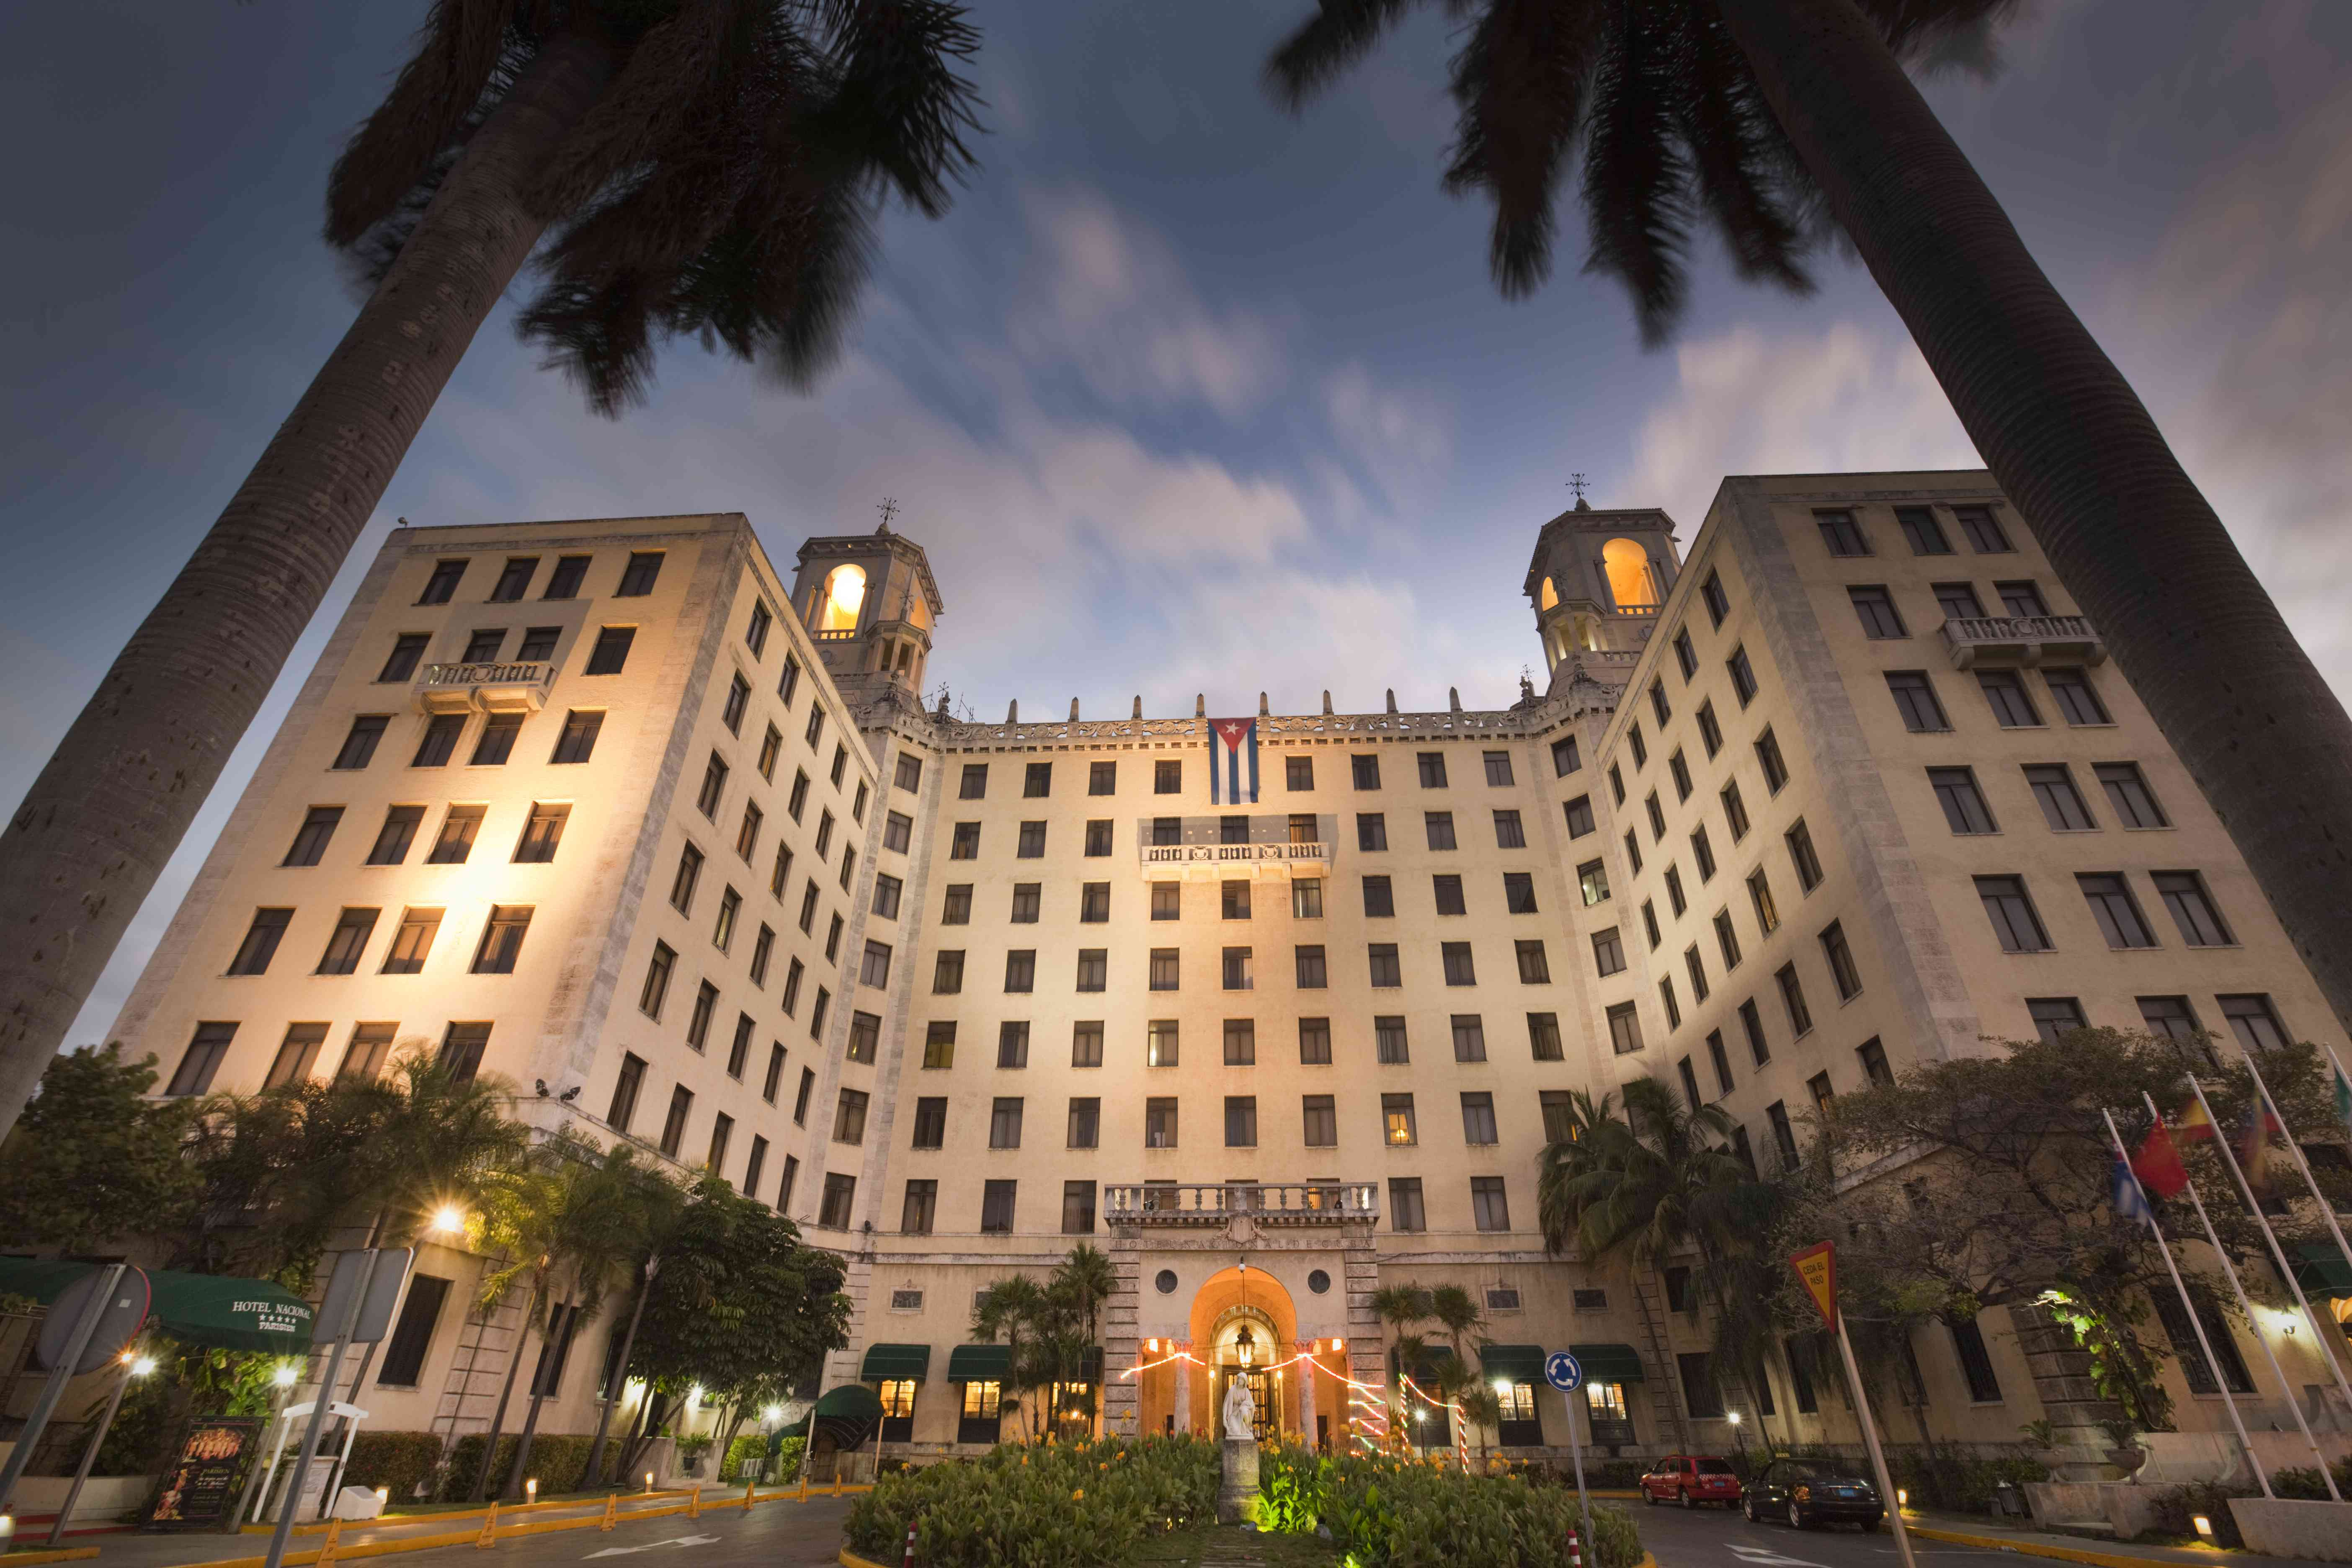 Hotel Nacional de Cuba of Havana